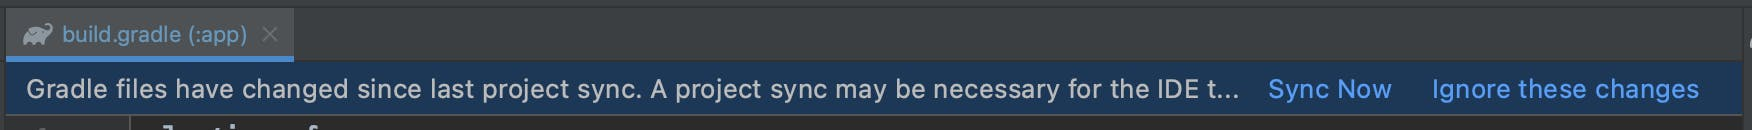 Android Studio Gradle sync notification